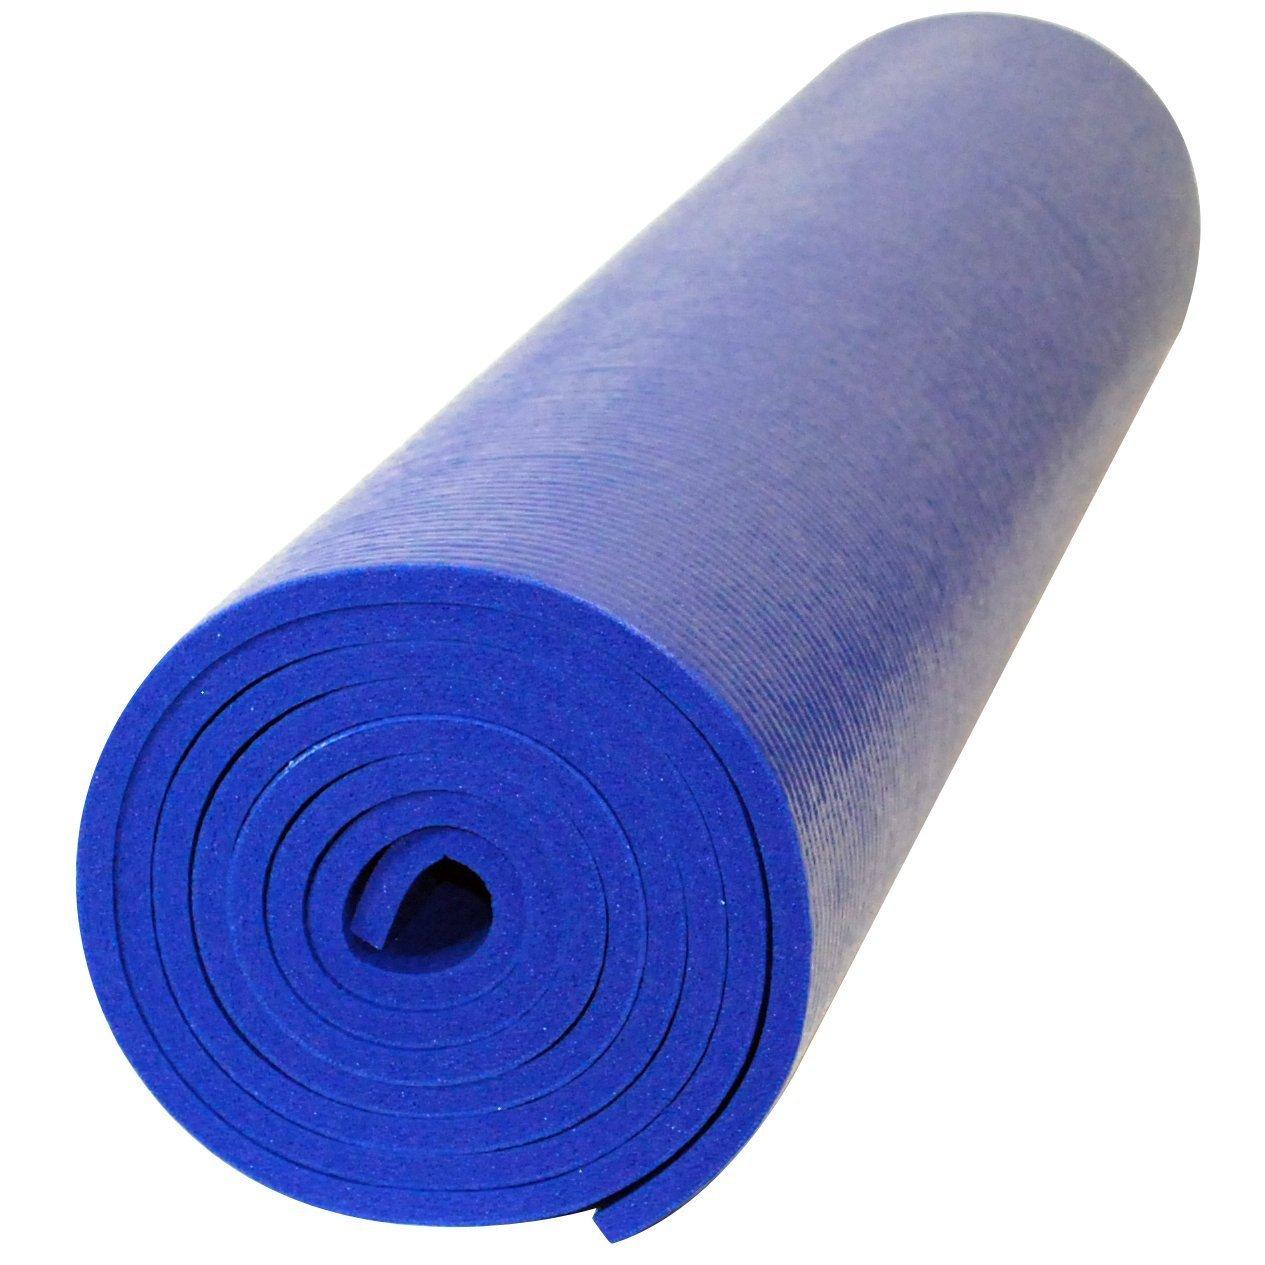 YogaAccessoriesプレミアム重量ヨガマット B0081UKDOY ブルー ブルー